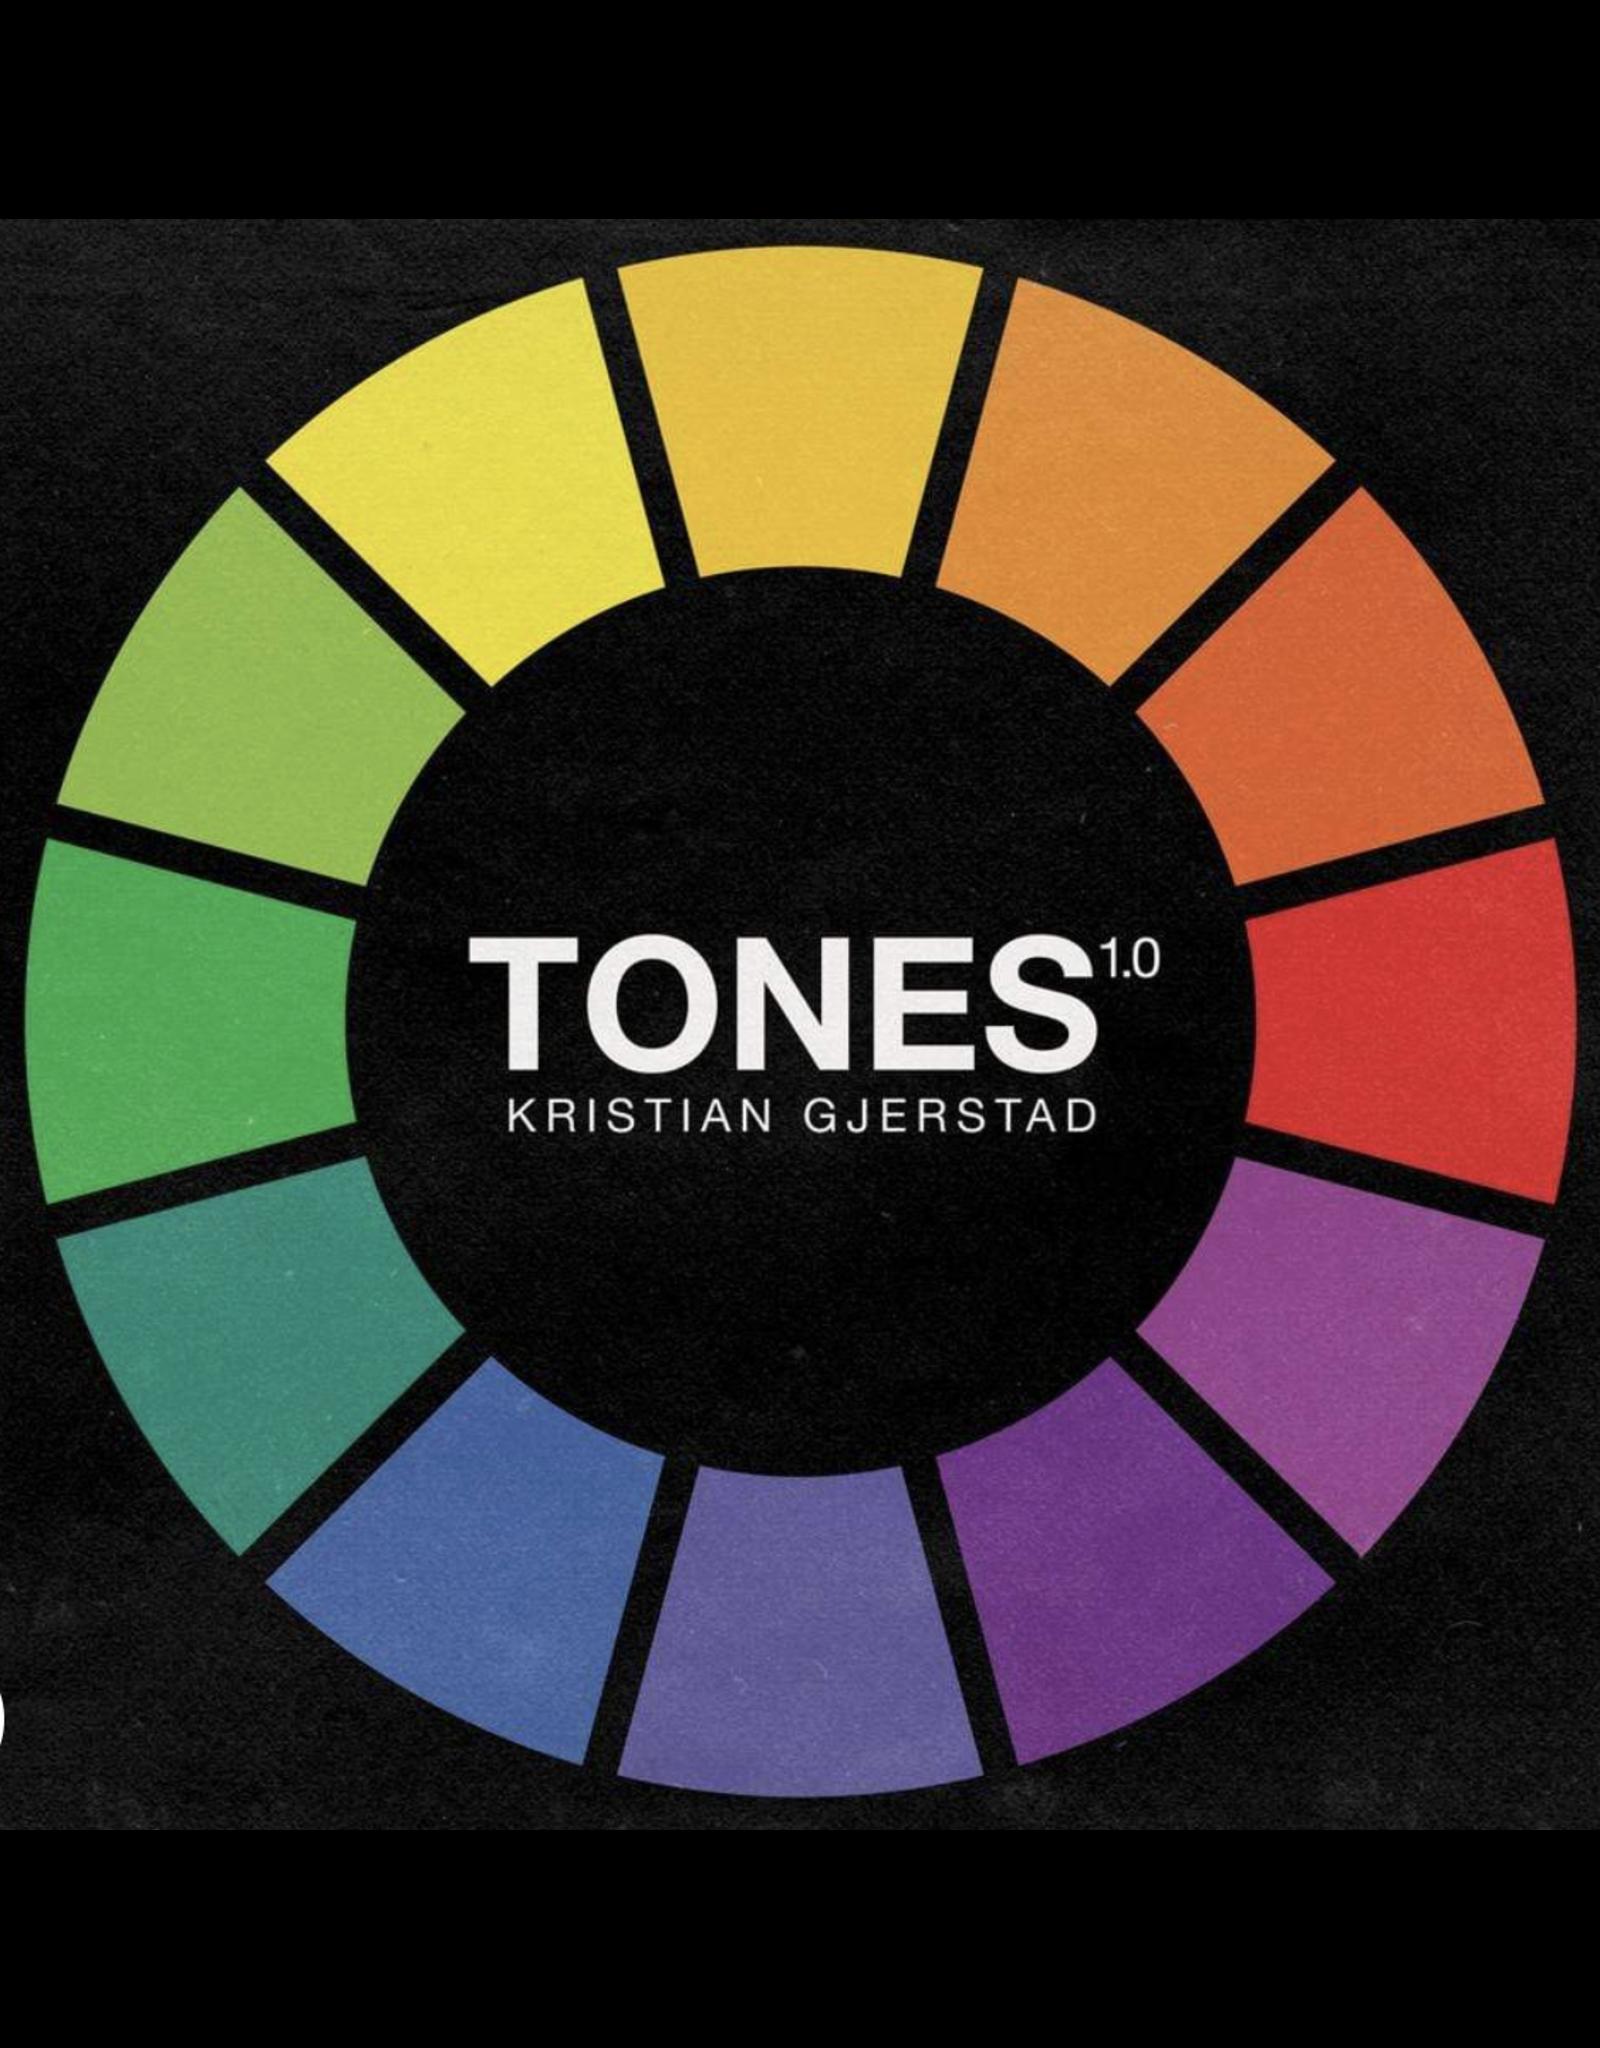 New Vinyl Kristian Gjerstad - Tones 1.0 LP